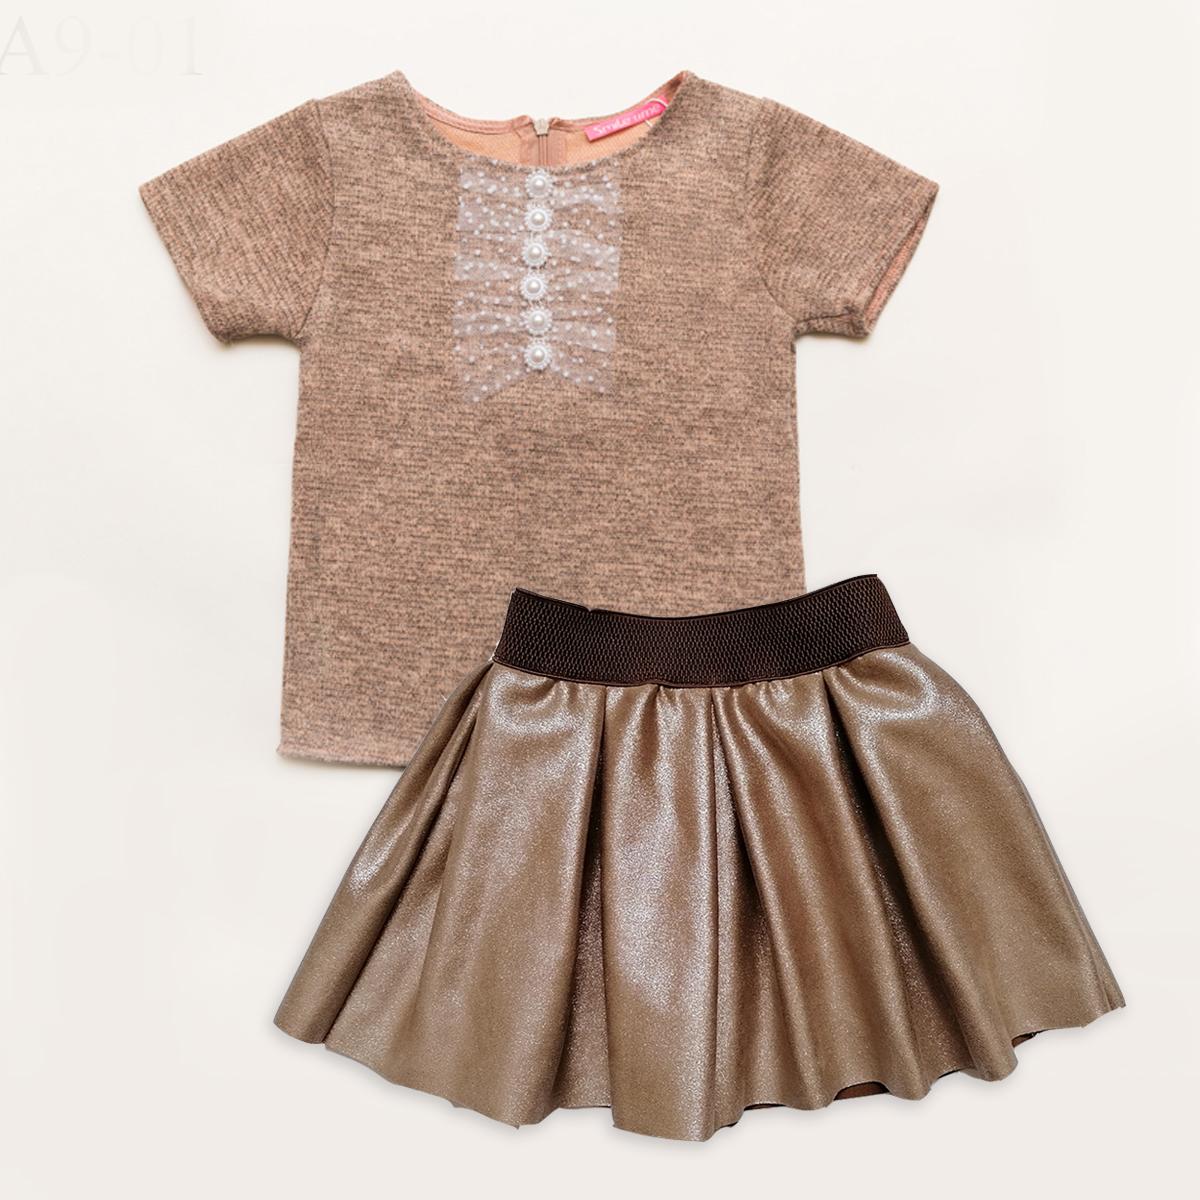 Комплект для девочки SmileTime блузка и юбка Lux, бежевый